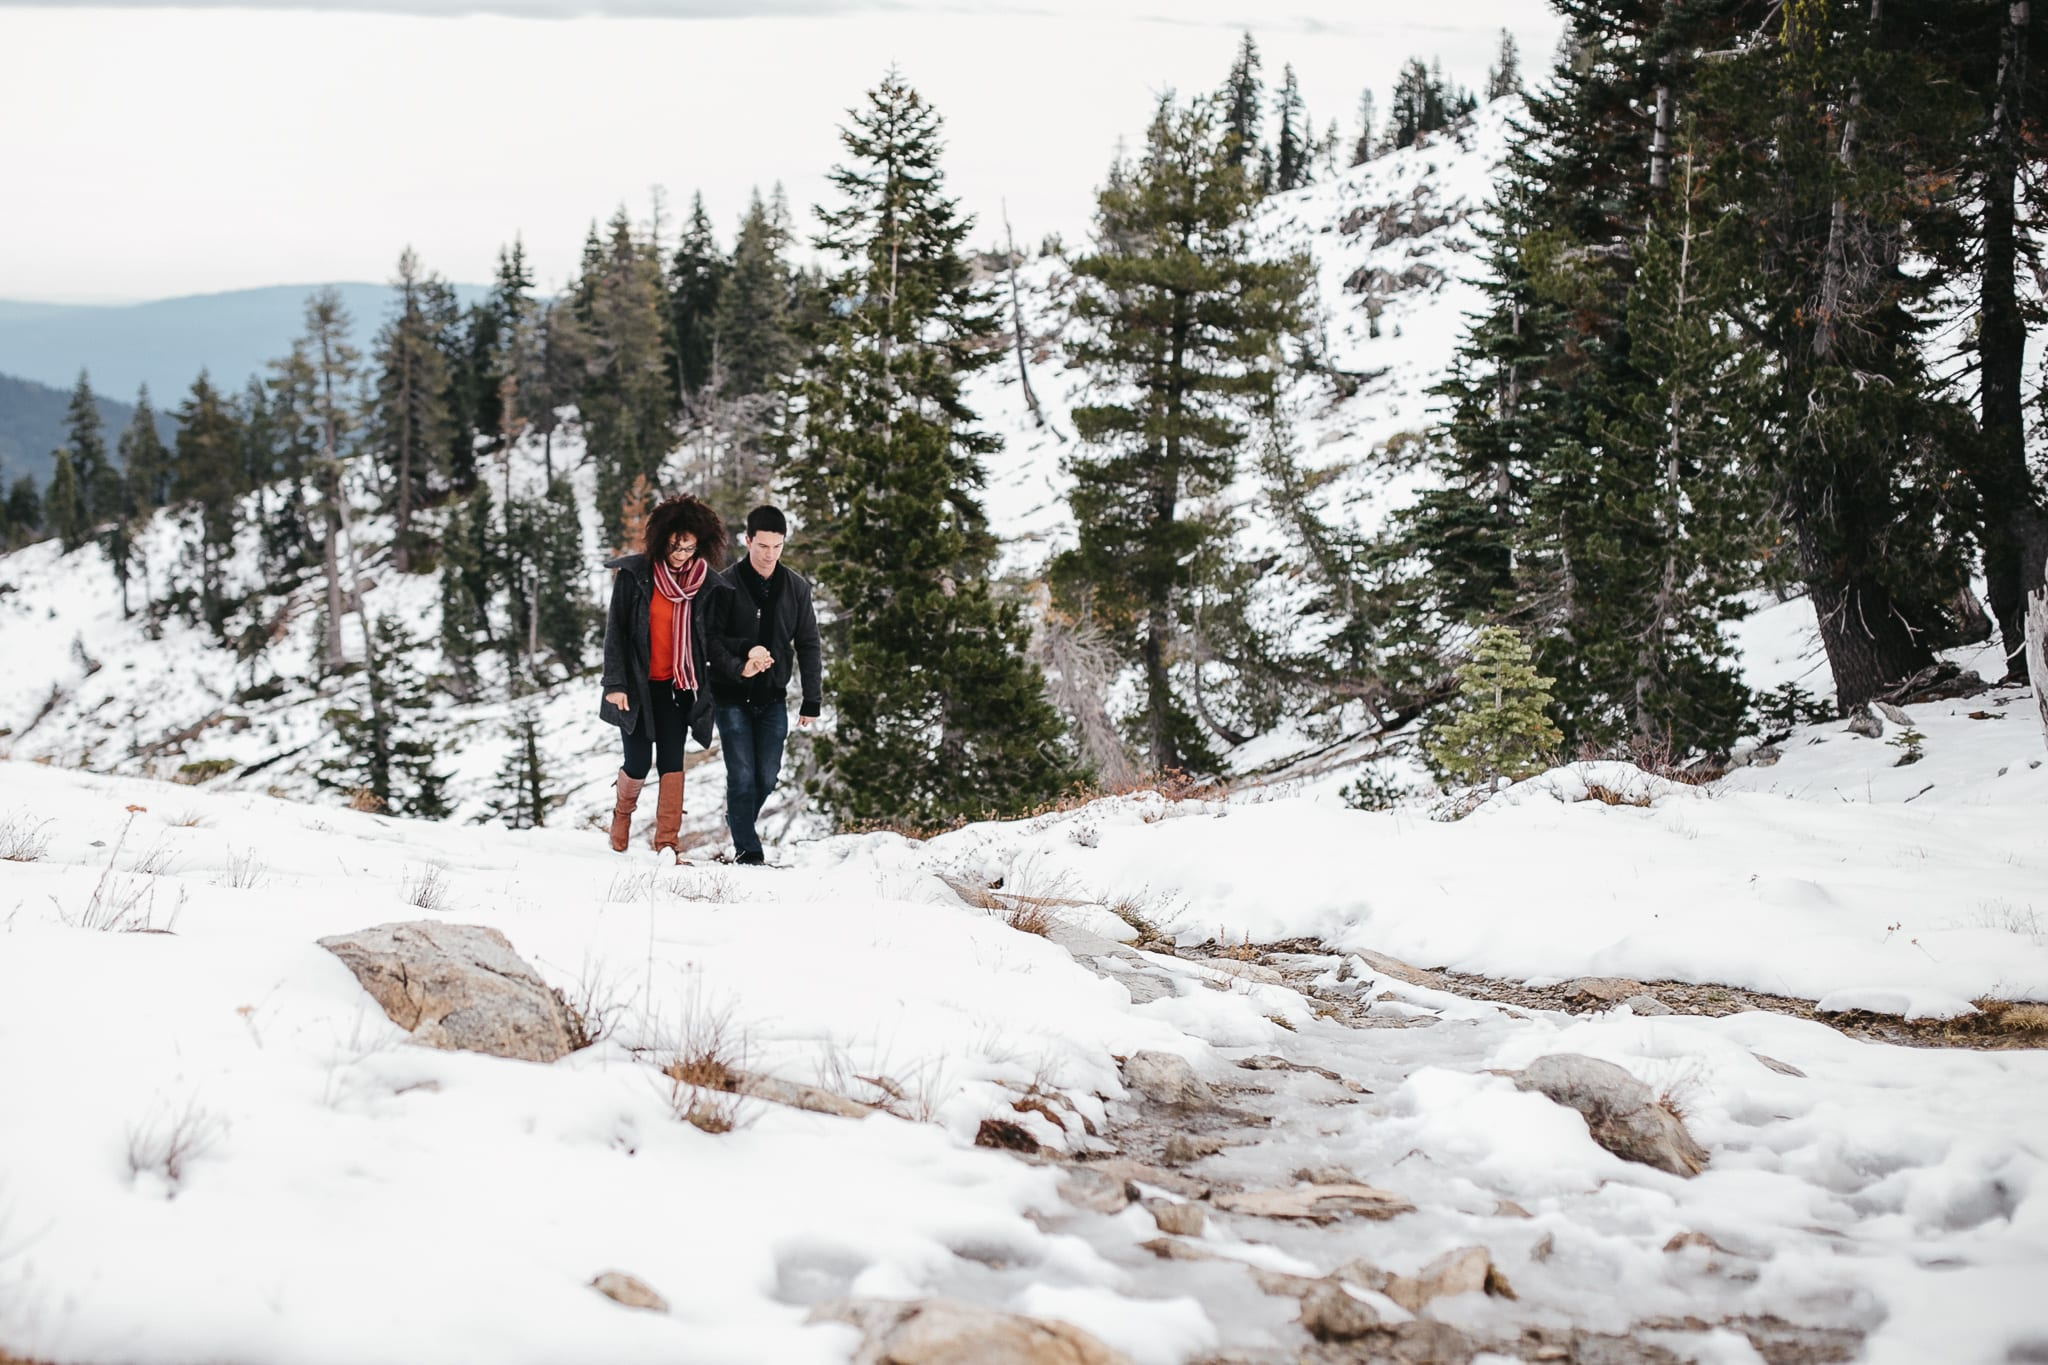 little-castle-lake-heart-lake-shasta-california-engagement-photographer-9